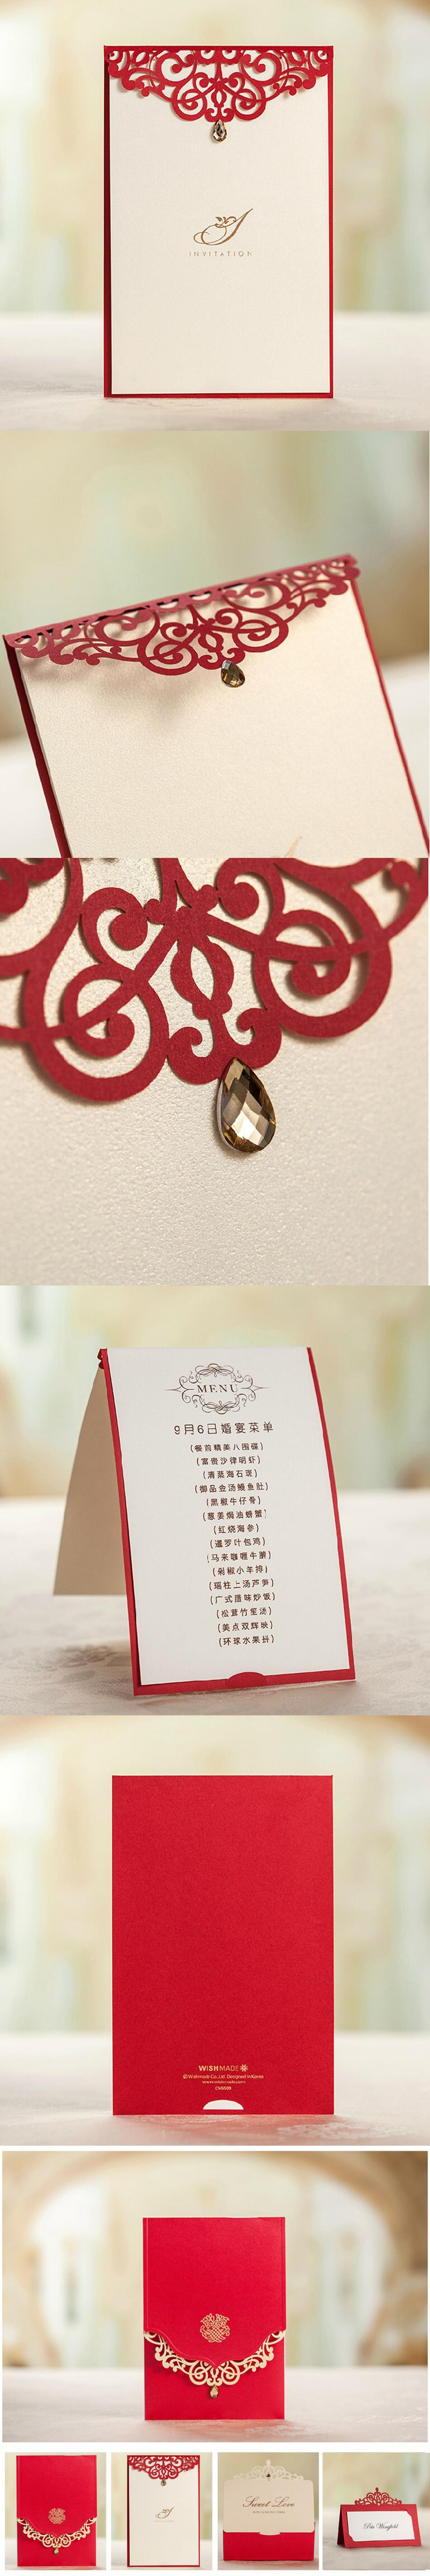 Royal Red Laser Cut Wedding Invitation and Menu Cards Free ...